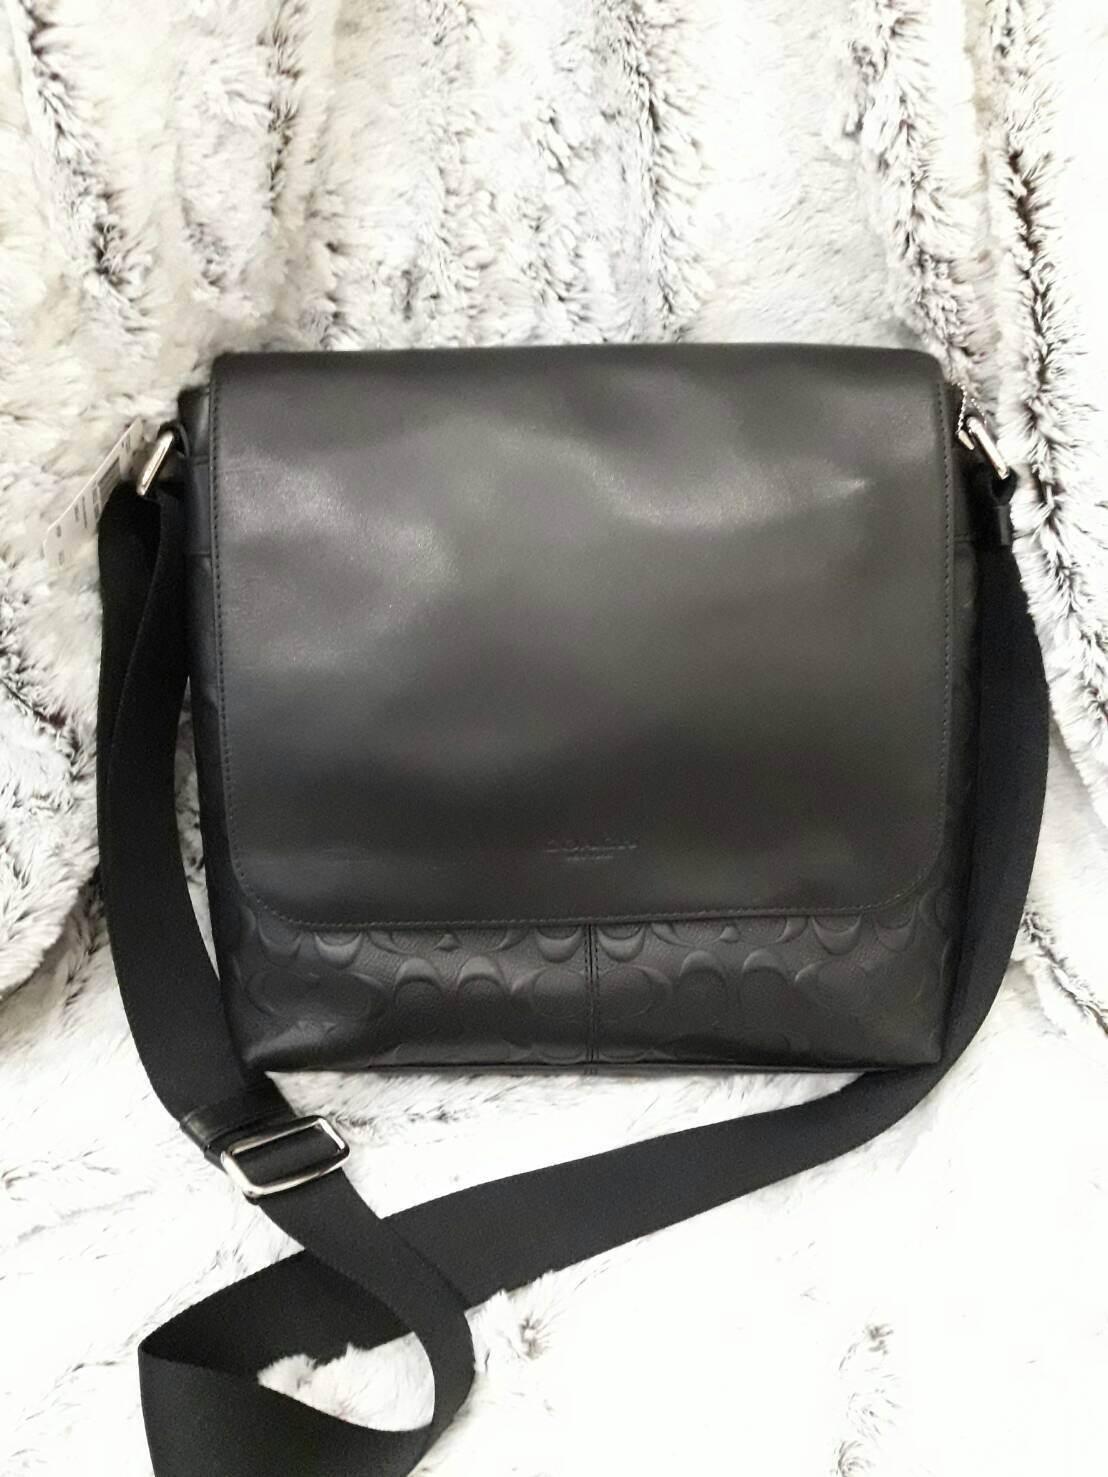 COACH Men F72220 Leather Messenger Bag กระเป๋าสะพายคุณผู้ชาย